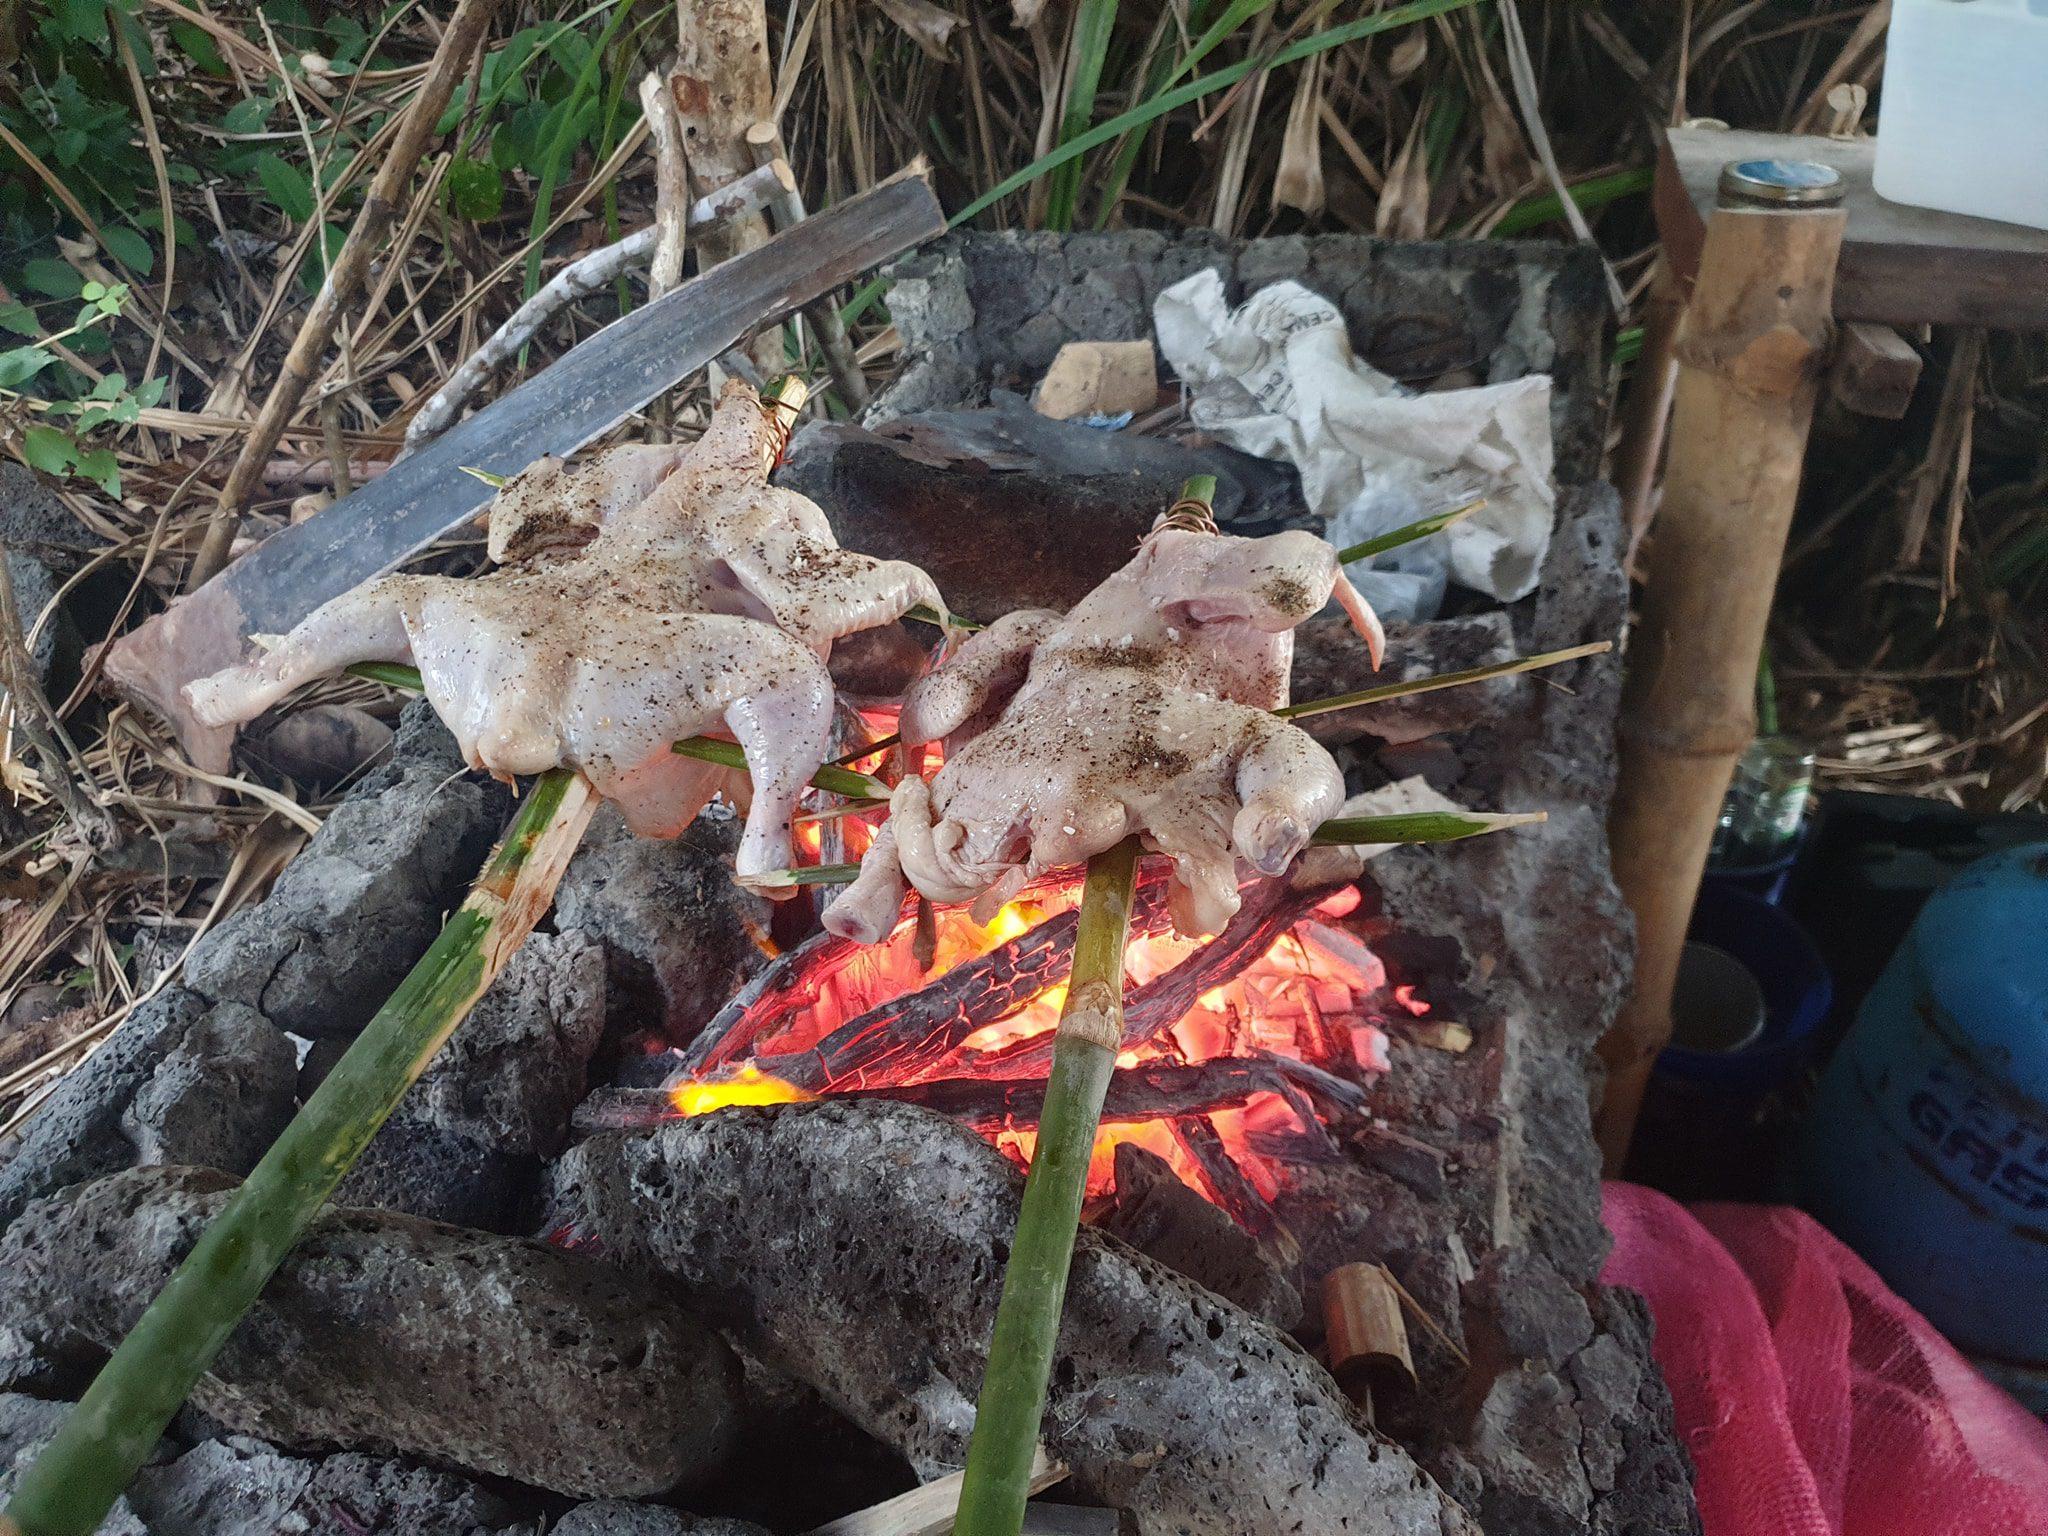 bamboo kebabs